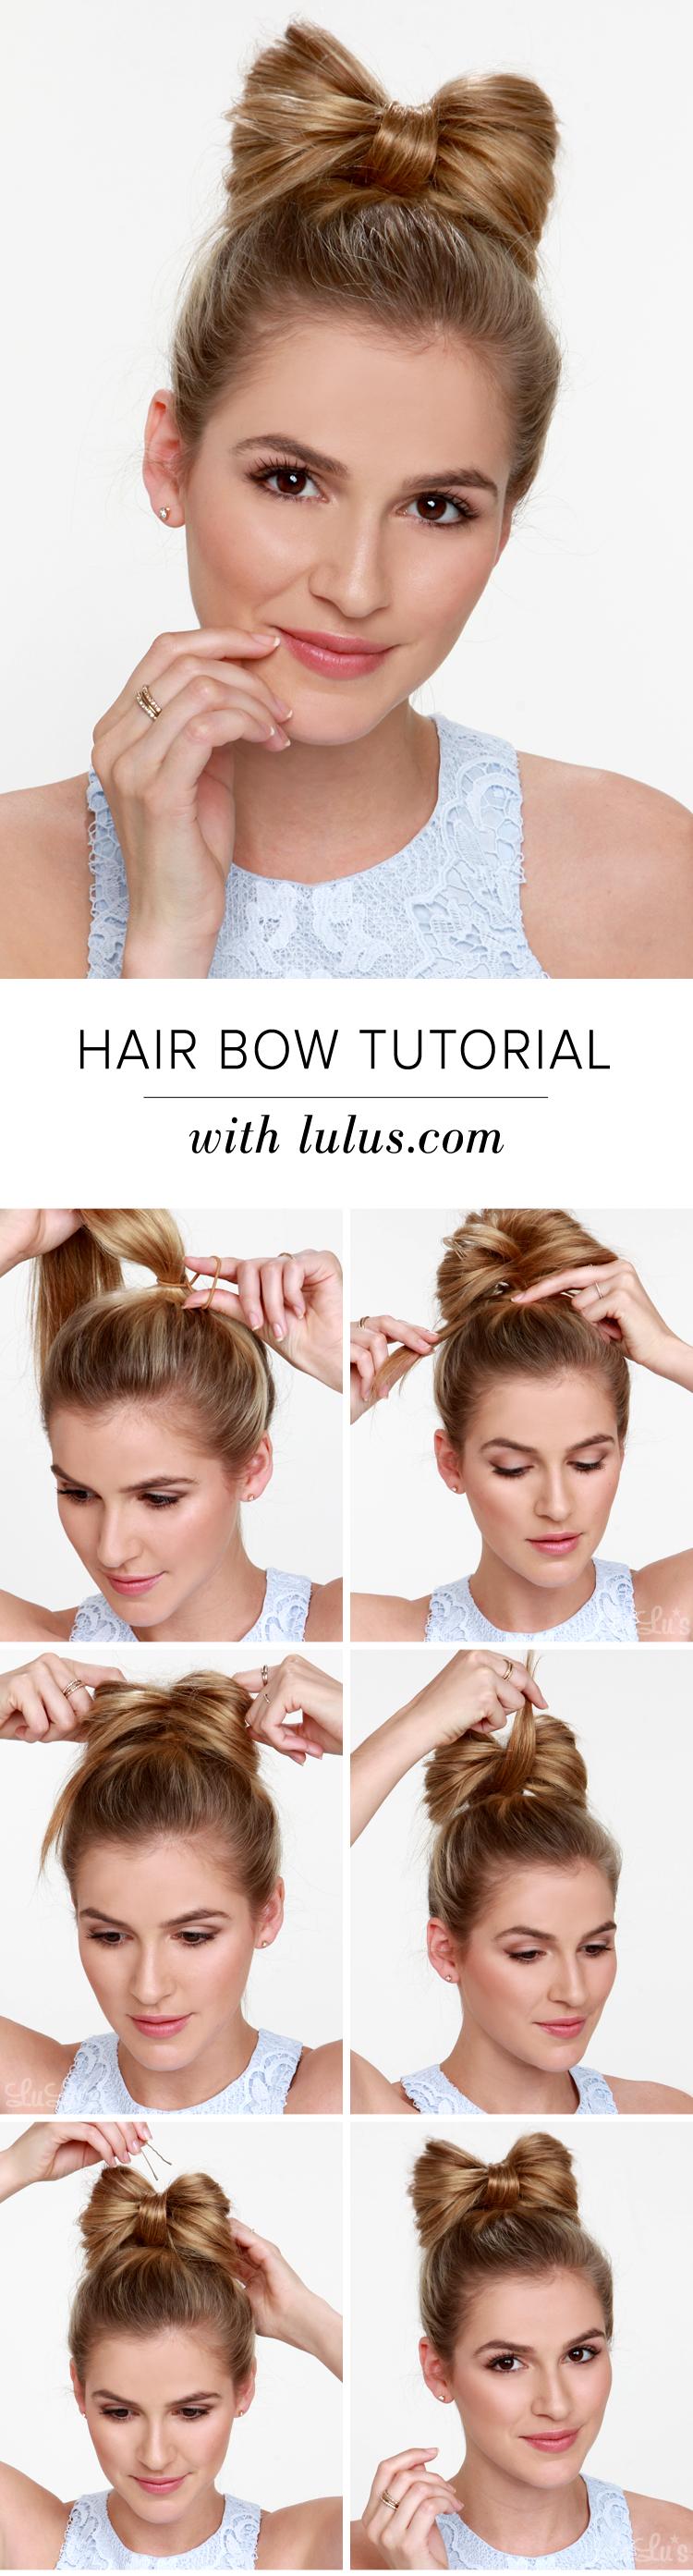 Lulus How To Hair Bow Tutorial Lulus Com Fashion Blog